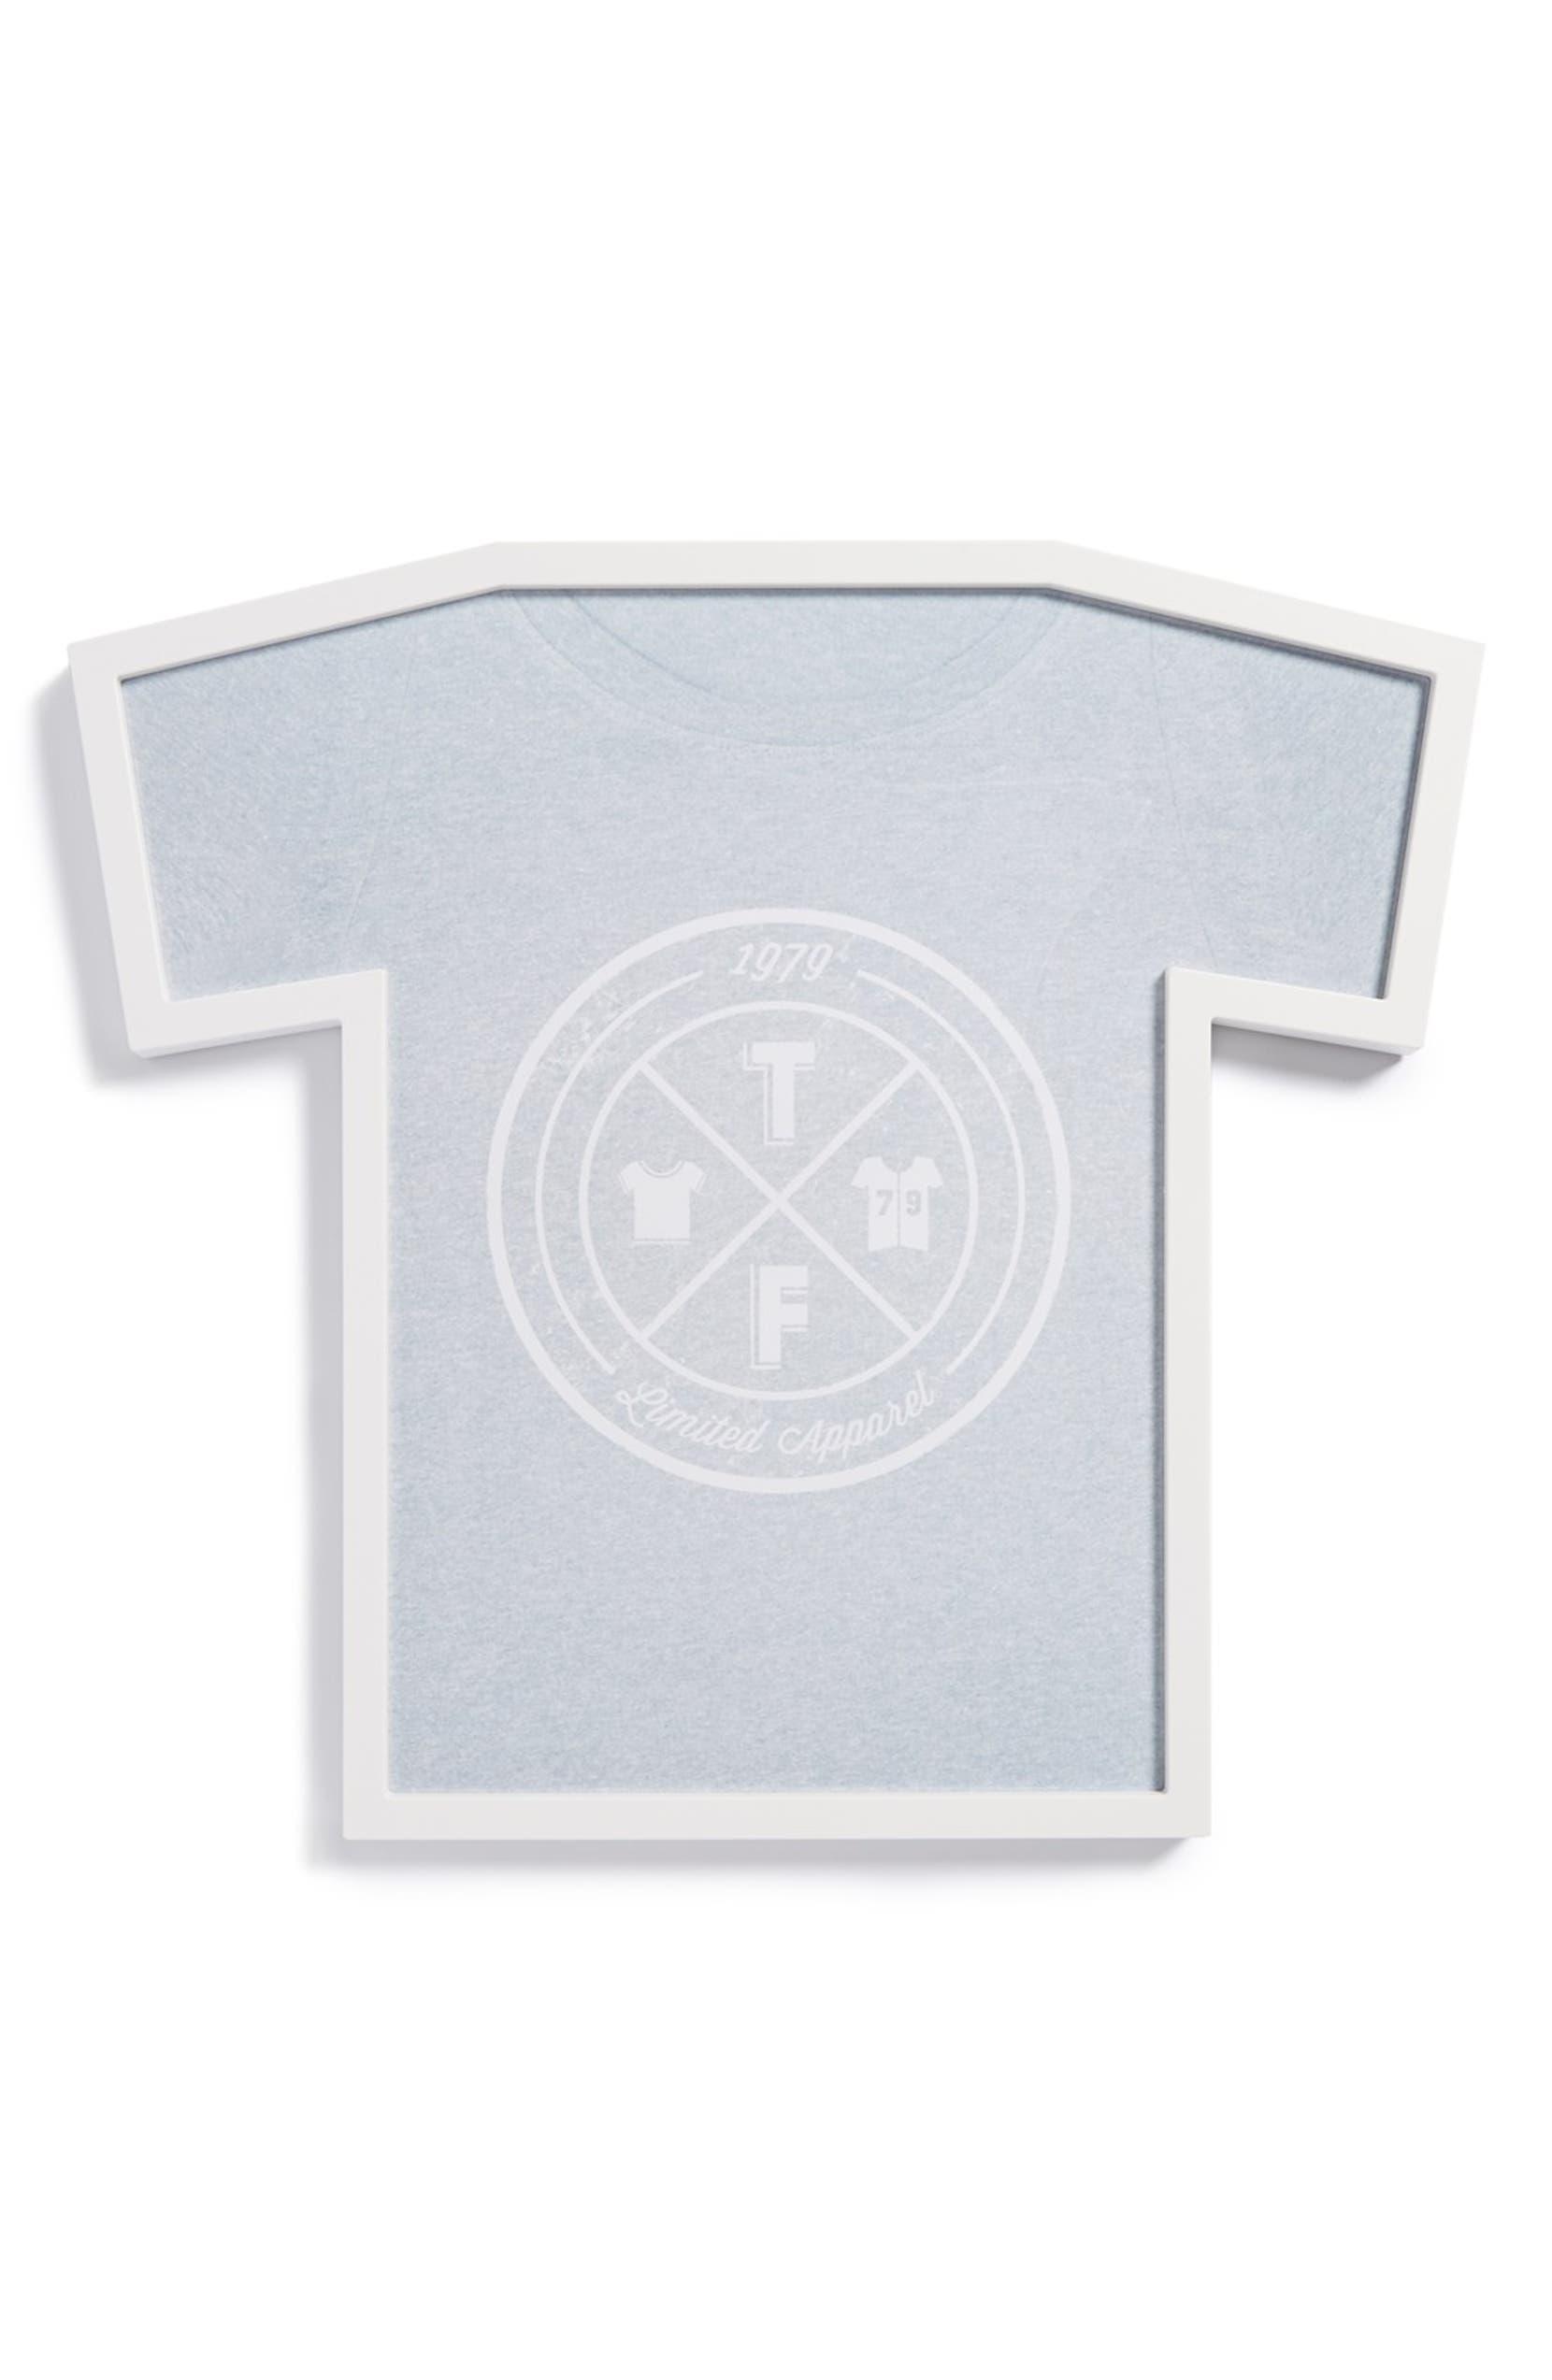 Umbra T Shirt Display Case ✓ Labzada T Shirt